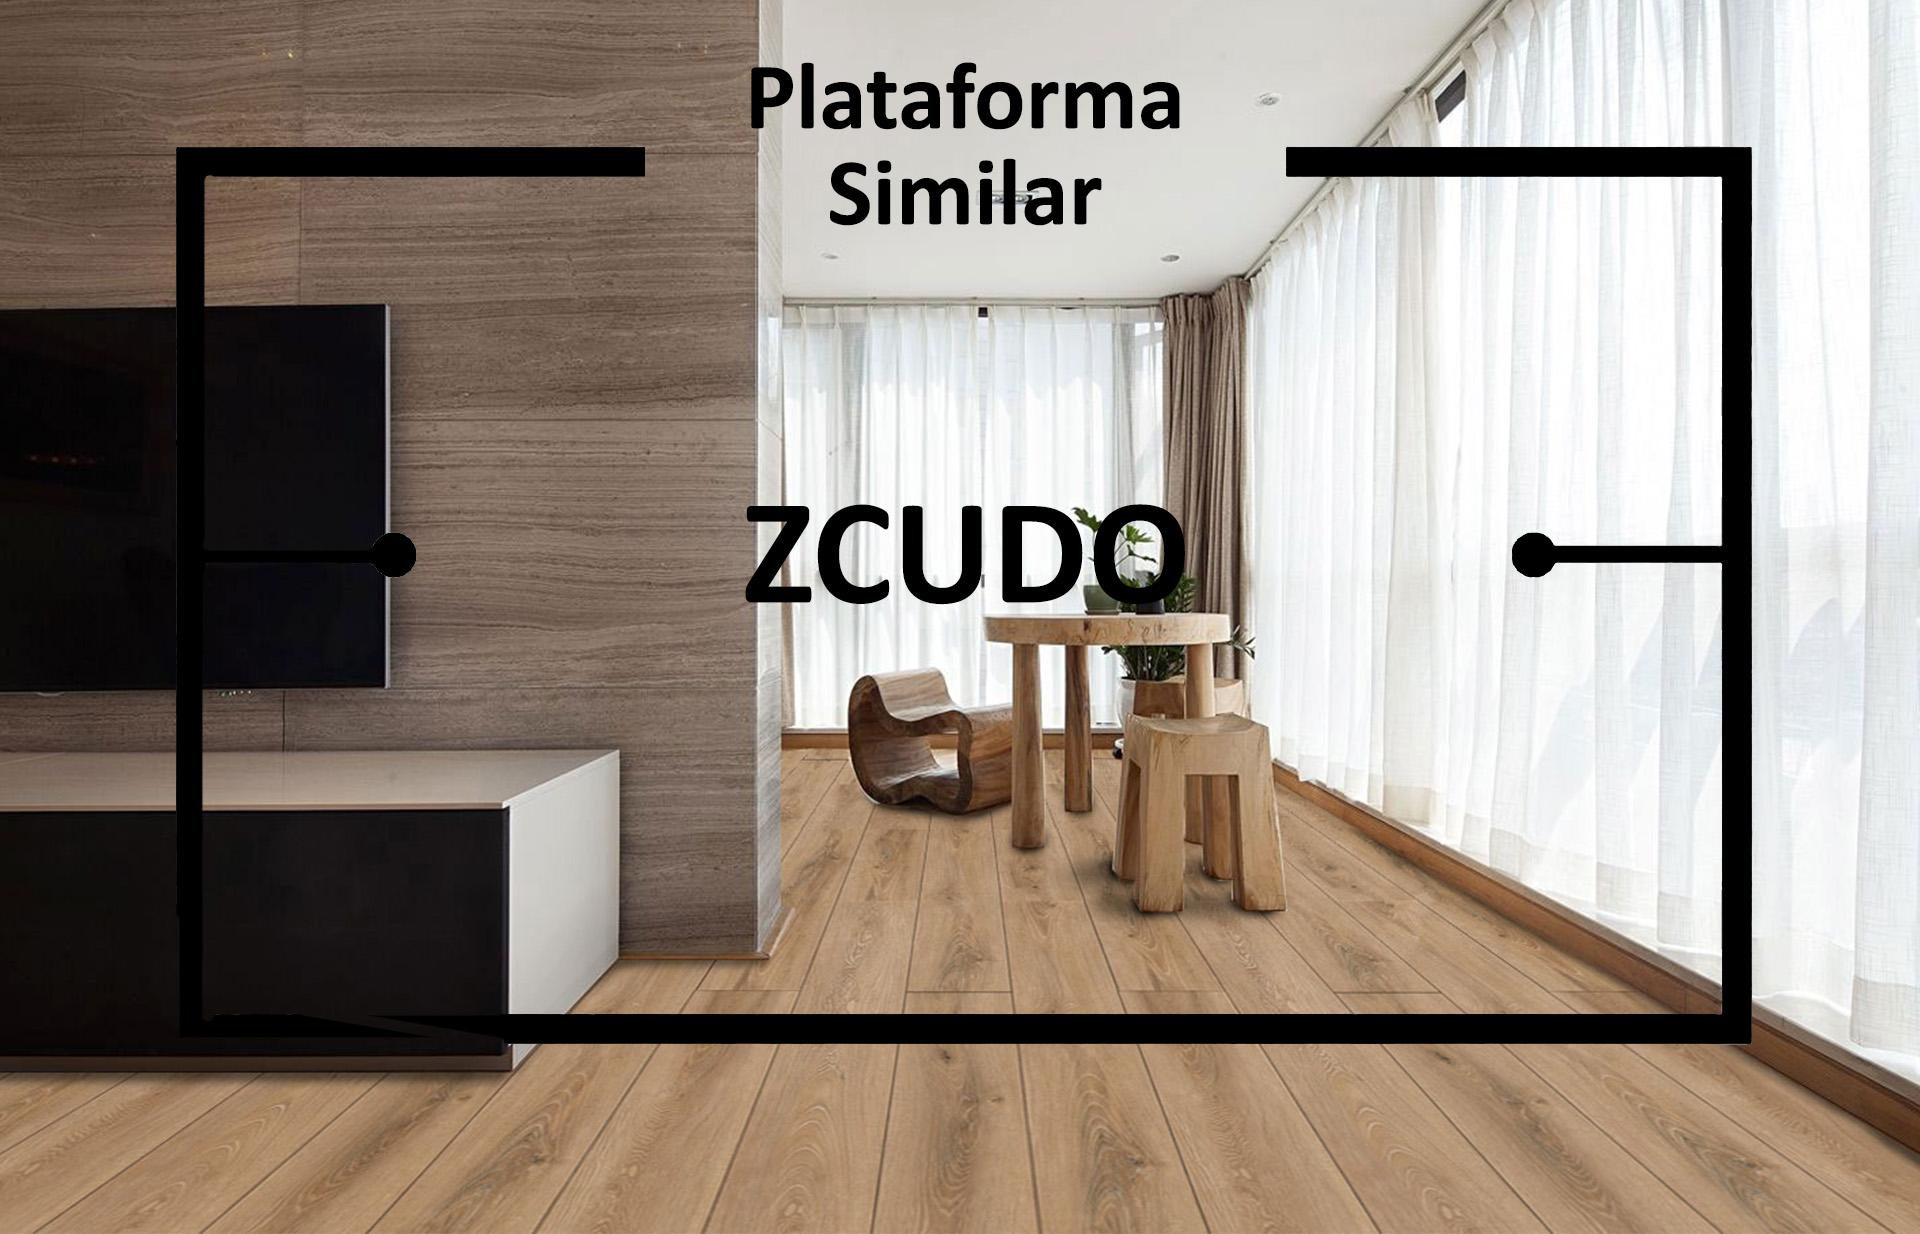 zcudo